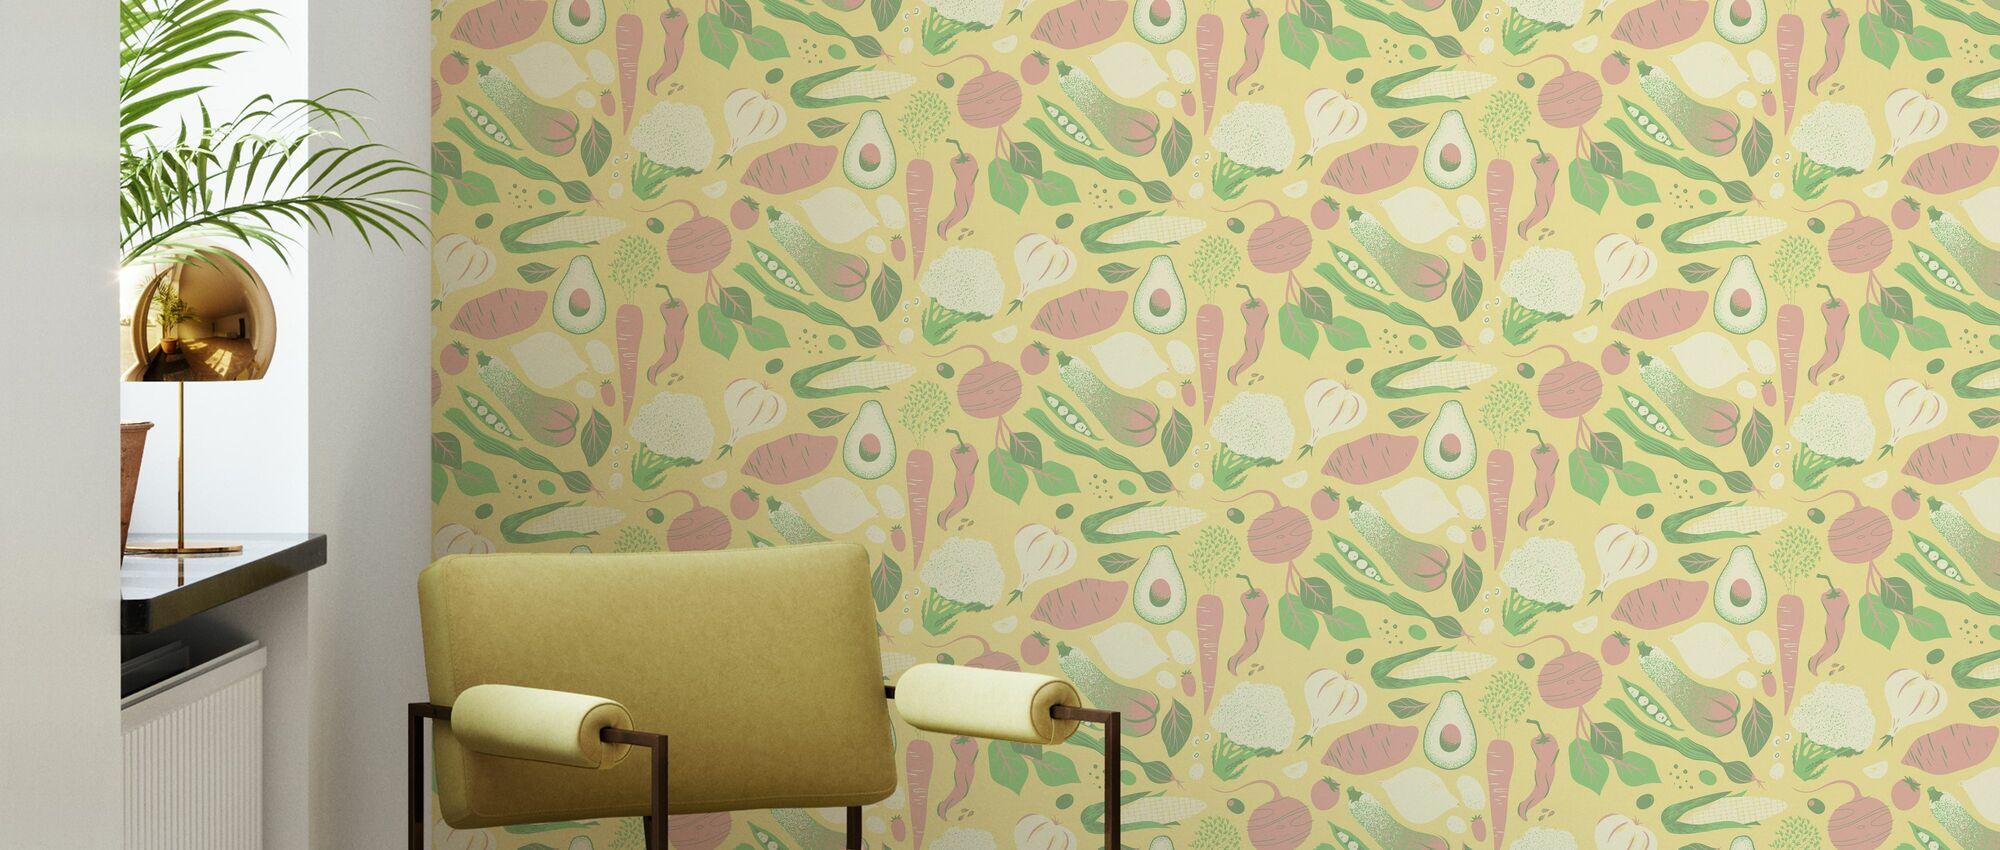 Greens Yellow - Wallpaper - Living Room